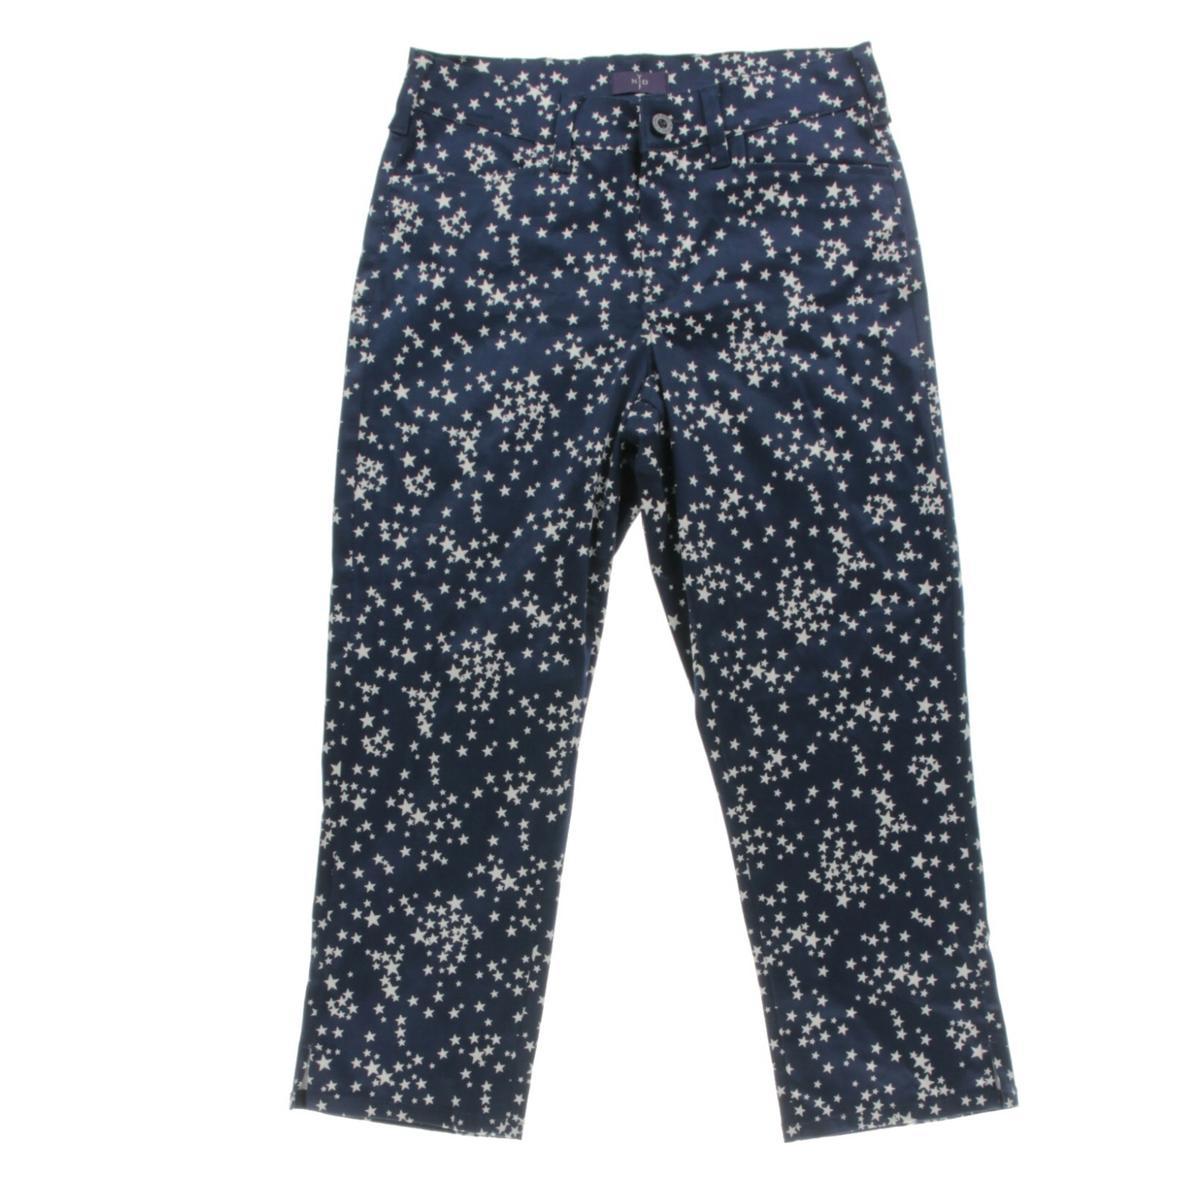 Perfect Womens Plus Size Floral Print Scuba Pants Animal Print Trousers Leggings 16-24